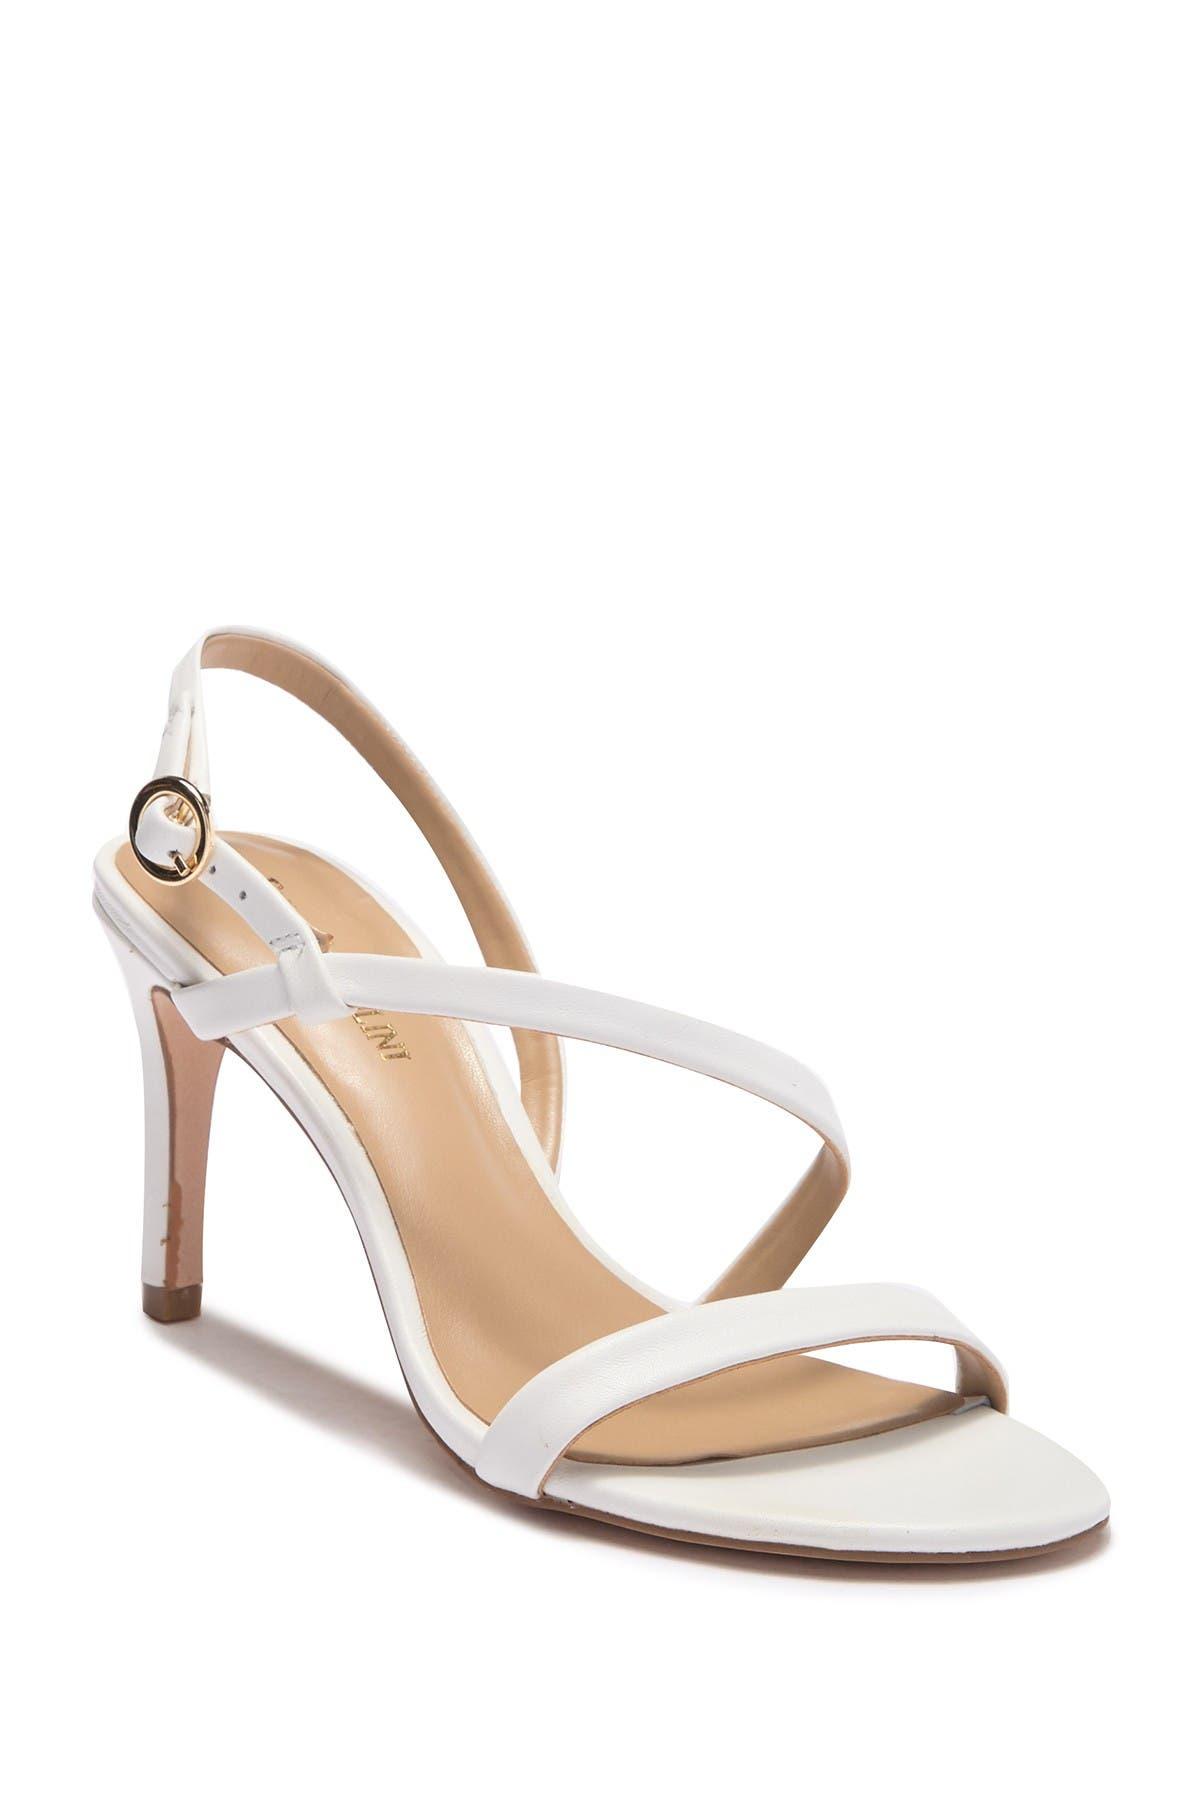 Image of Enzo Angiolini Sandria Stiletto Sandal